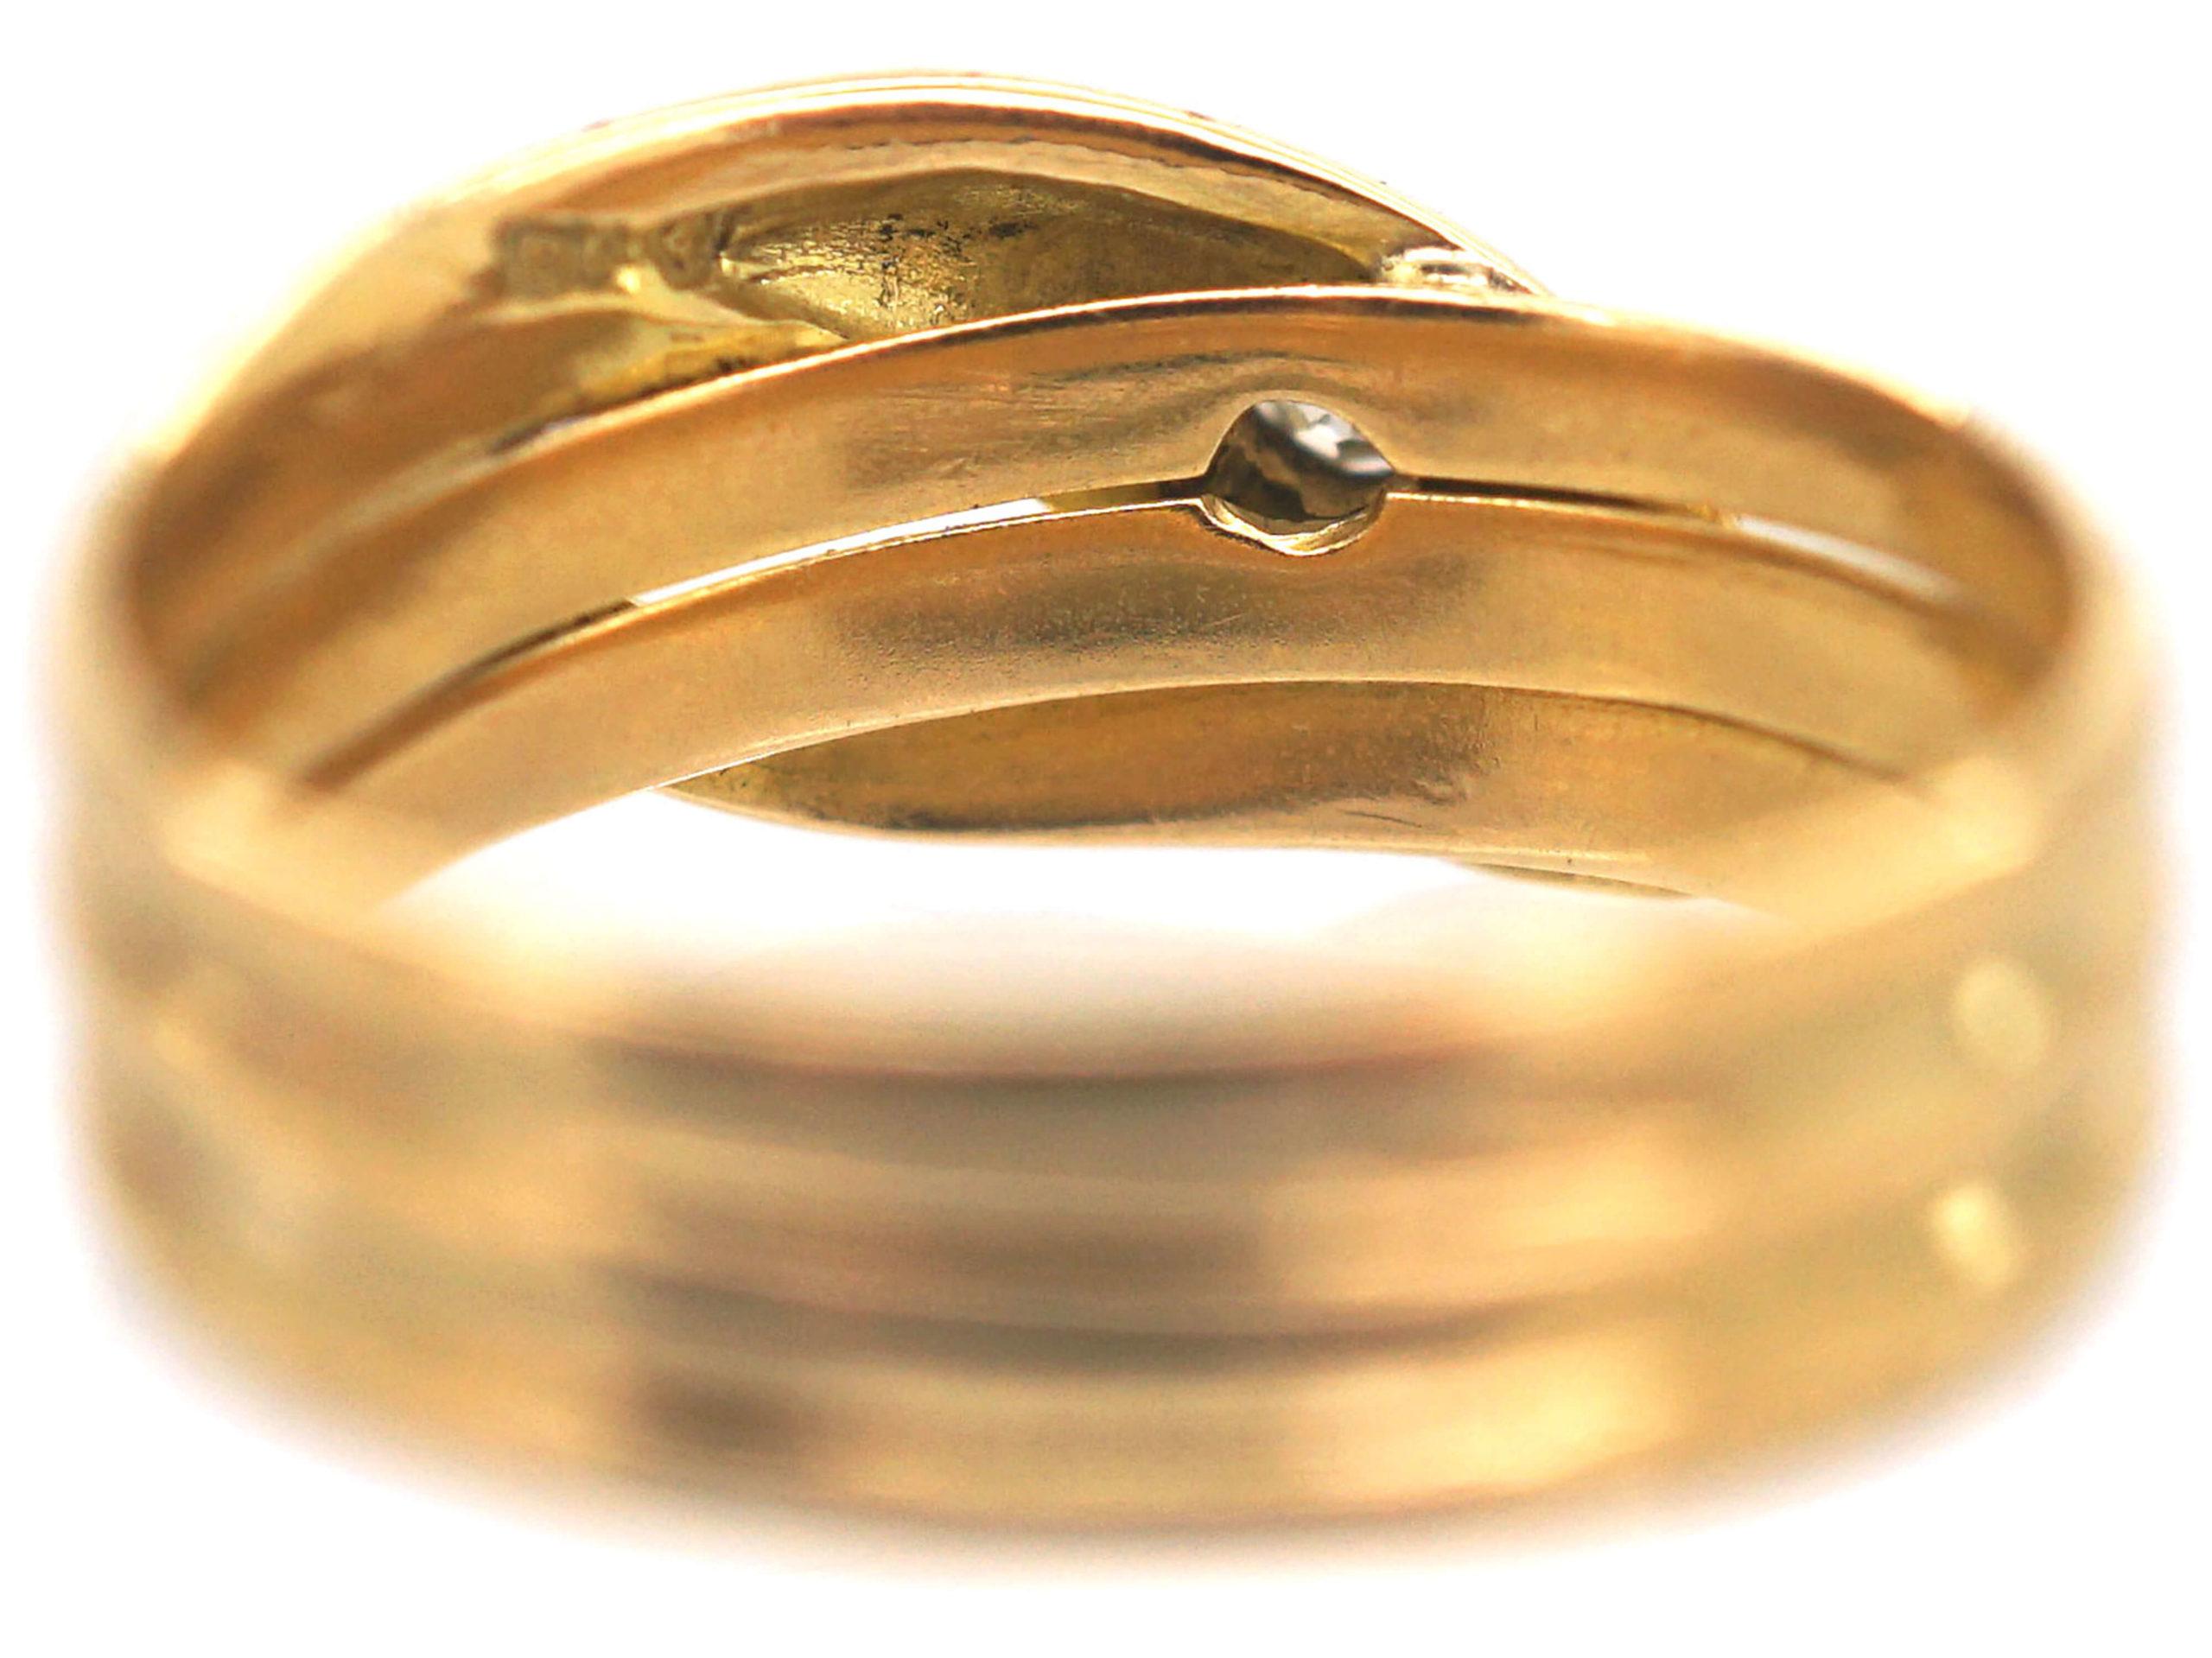 Edwardian 18ct Gold Snake Ring set with a Diamond